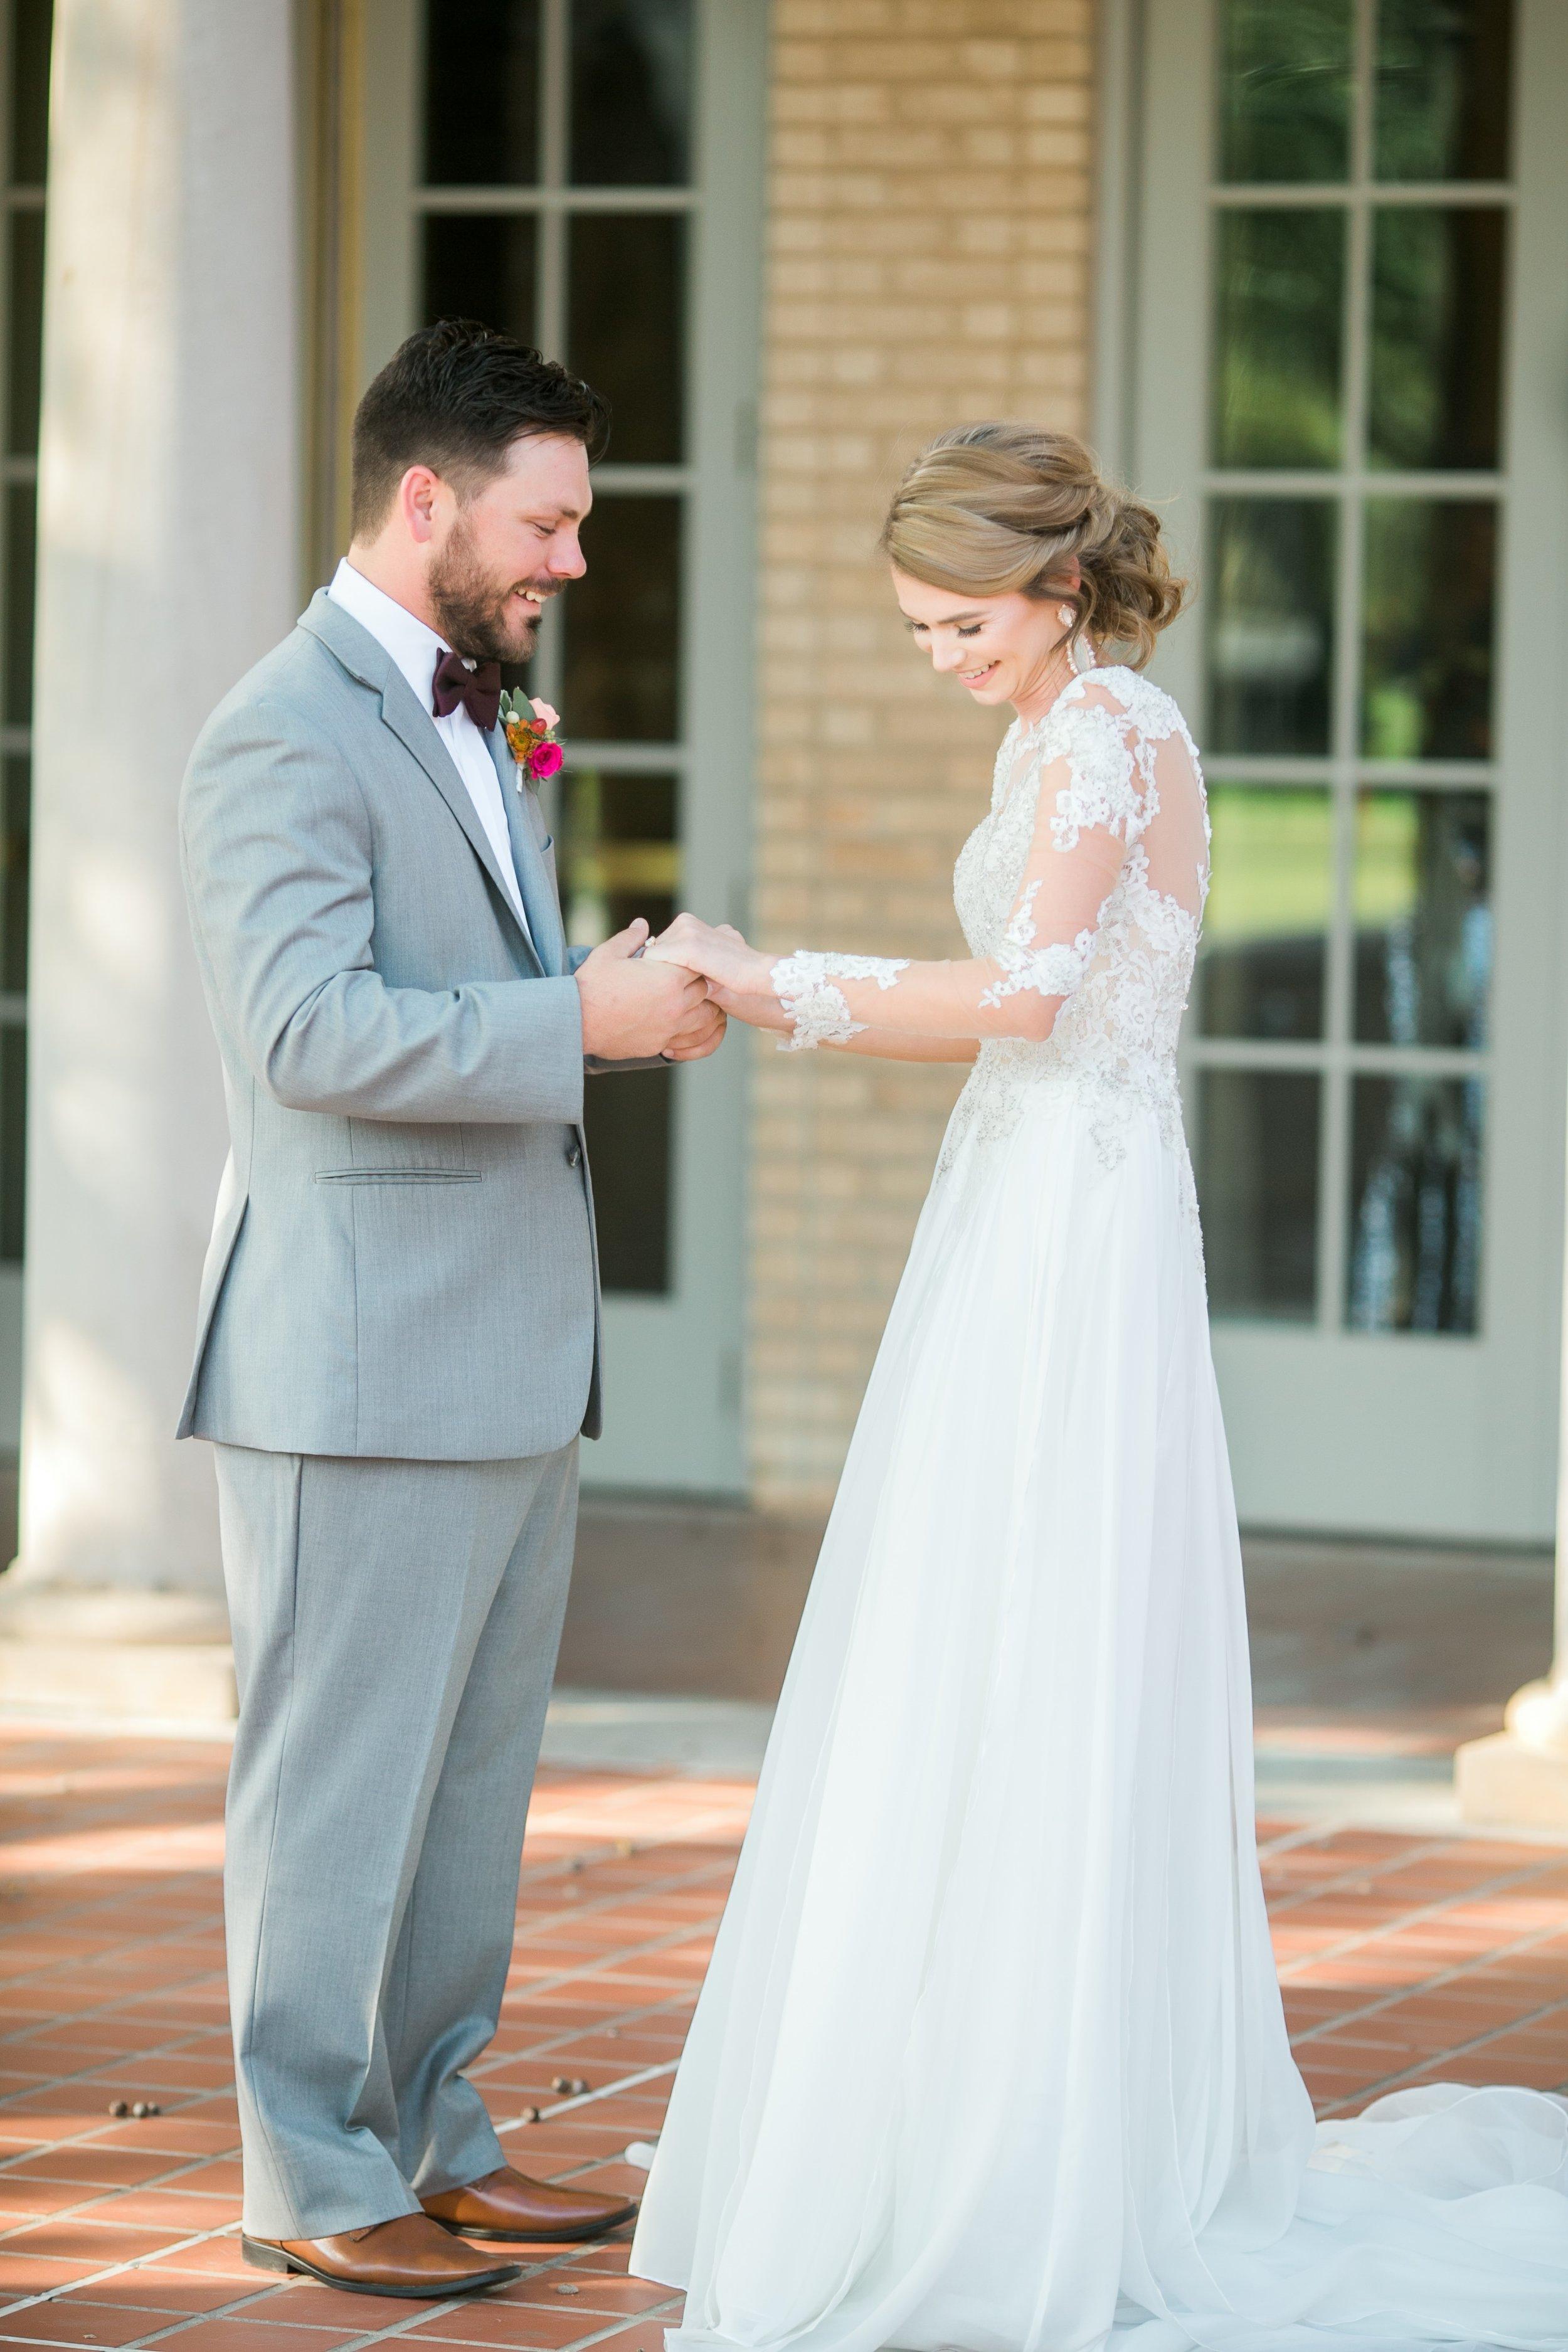 Roberson-Wedding-The-Forum-Lauren-Pinson-Wedding-Photography-Wichita-Falls-Texas-027.jpg